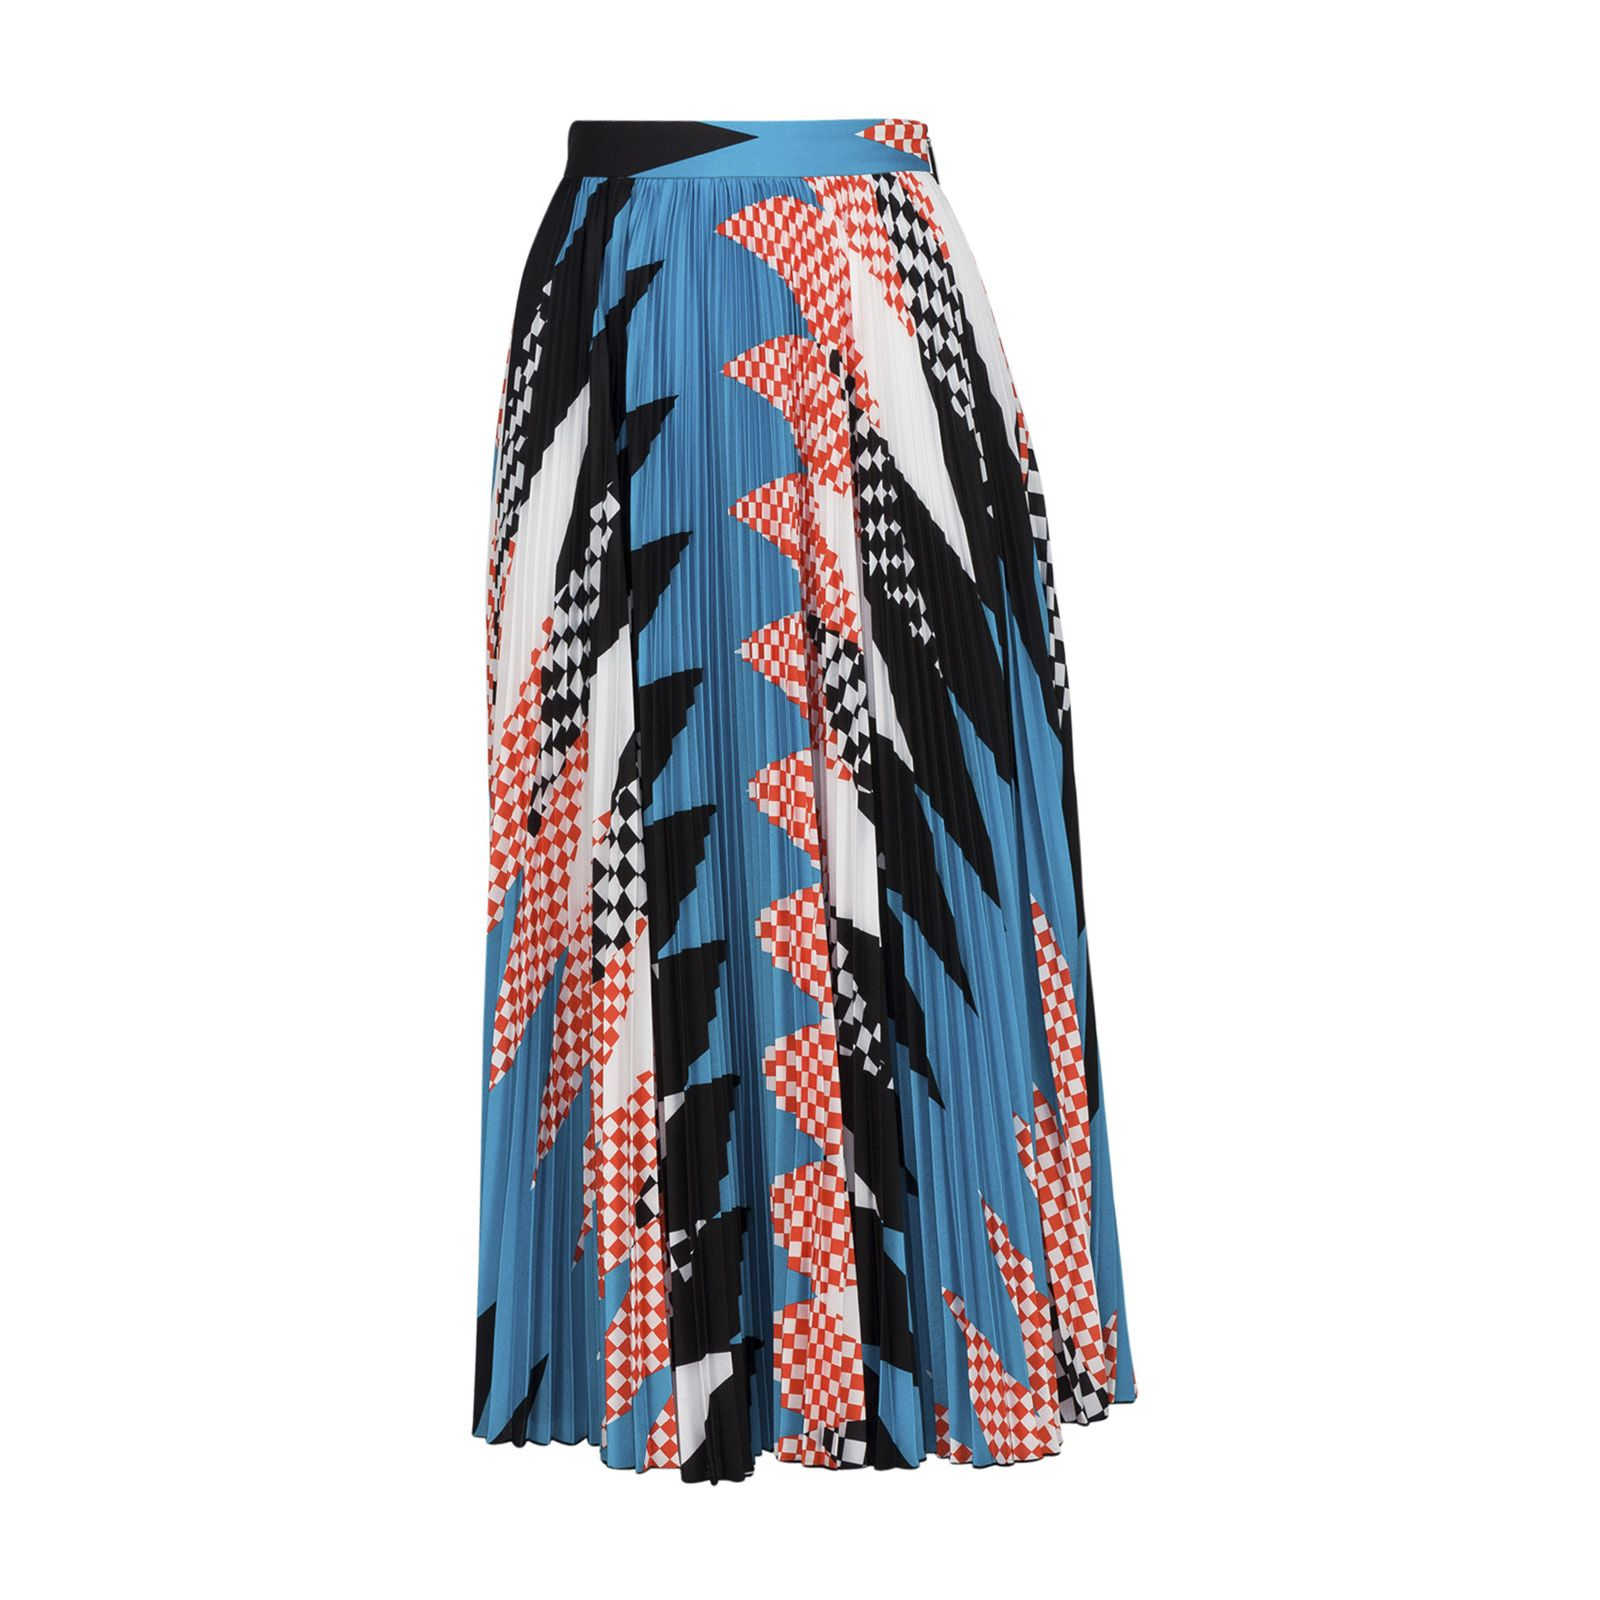 Msgm Pleated Novelty Print Skirt